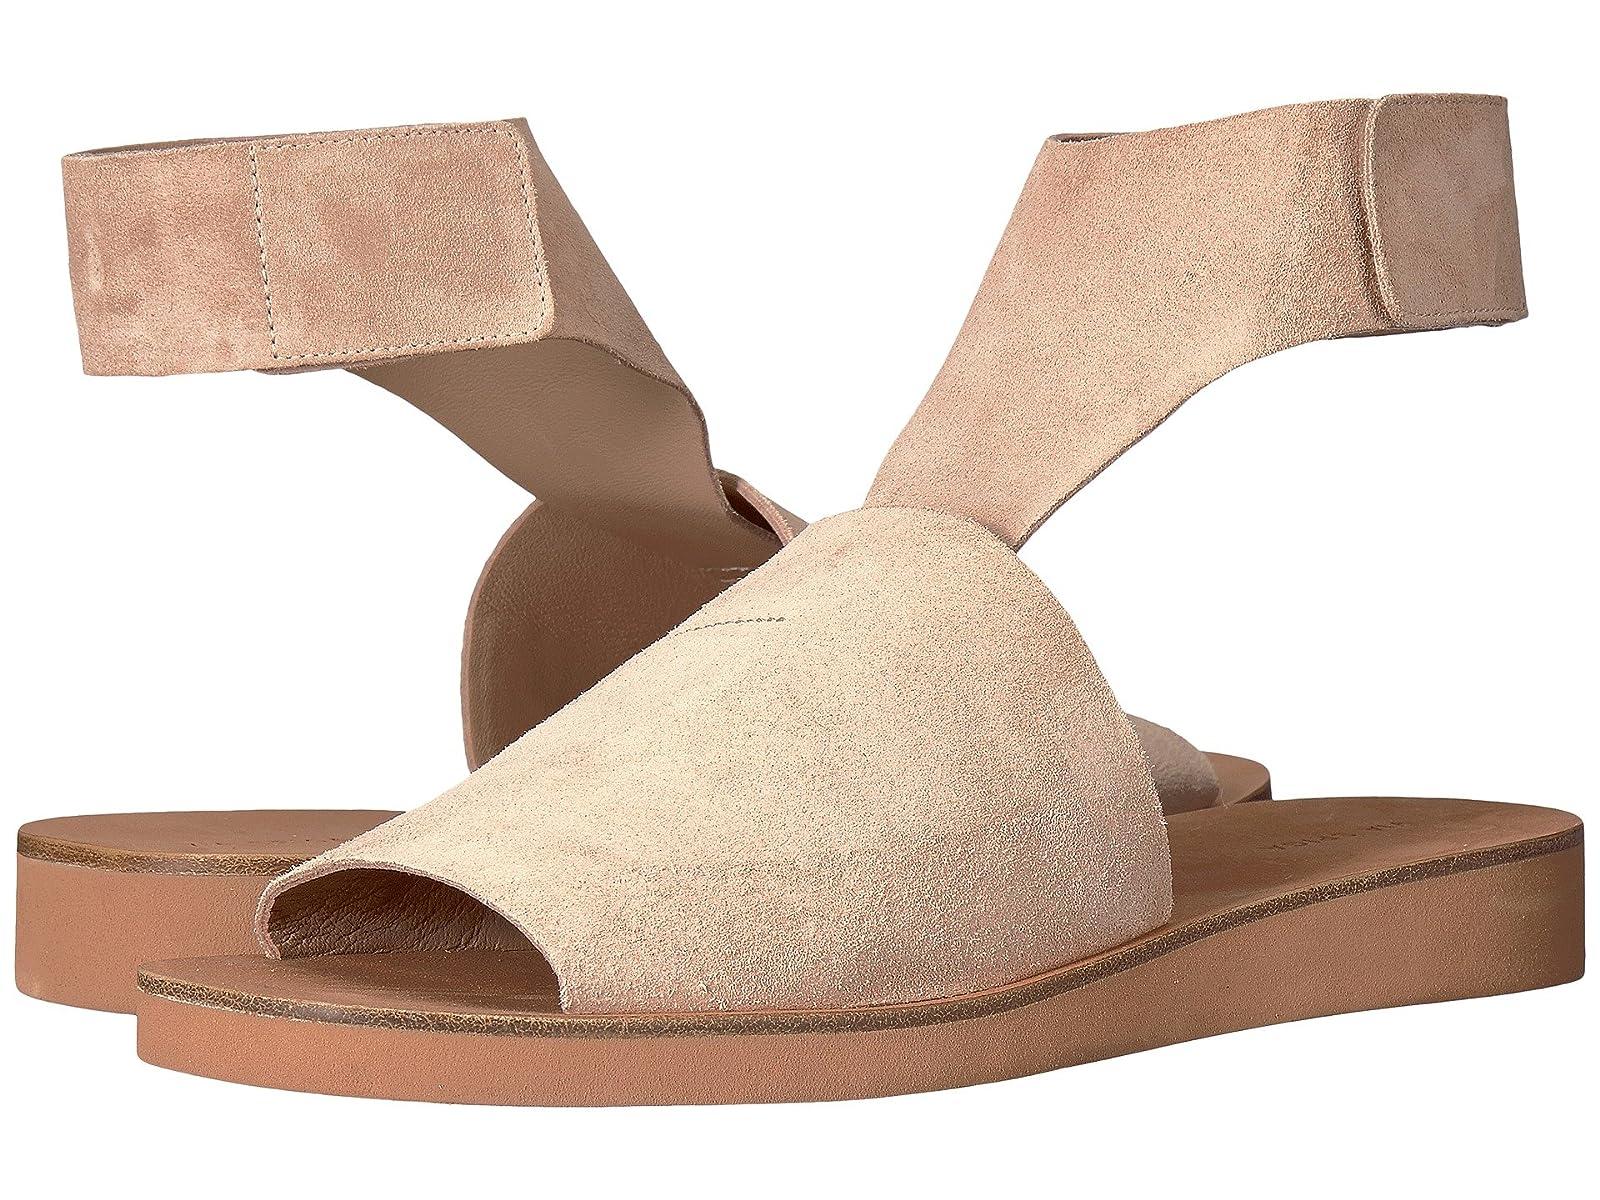 Via Spiga BriarAtmospheric grades have affordable shoes